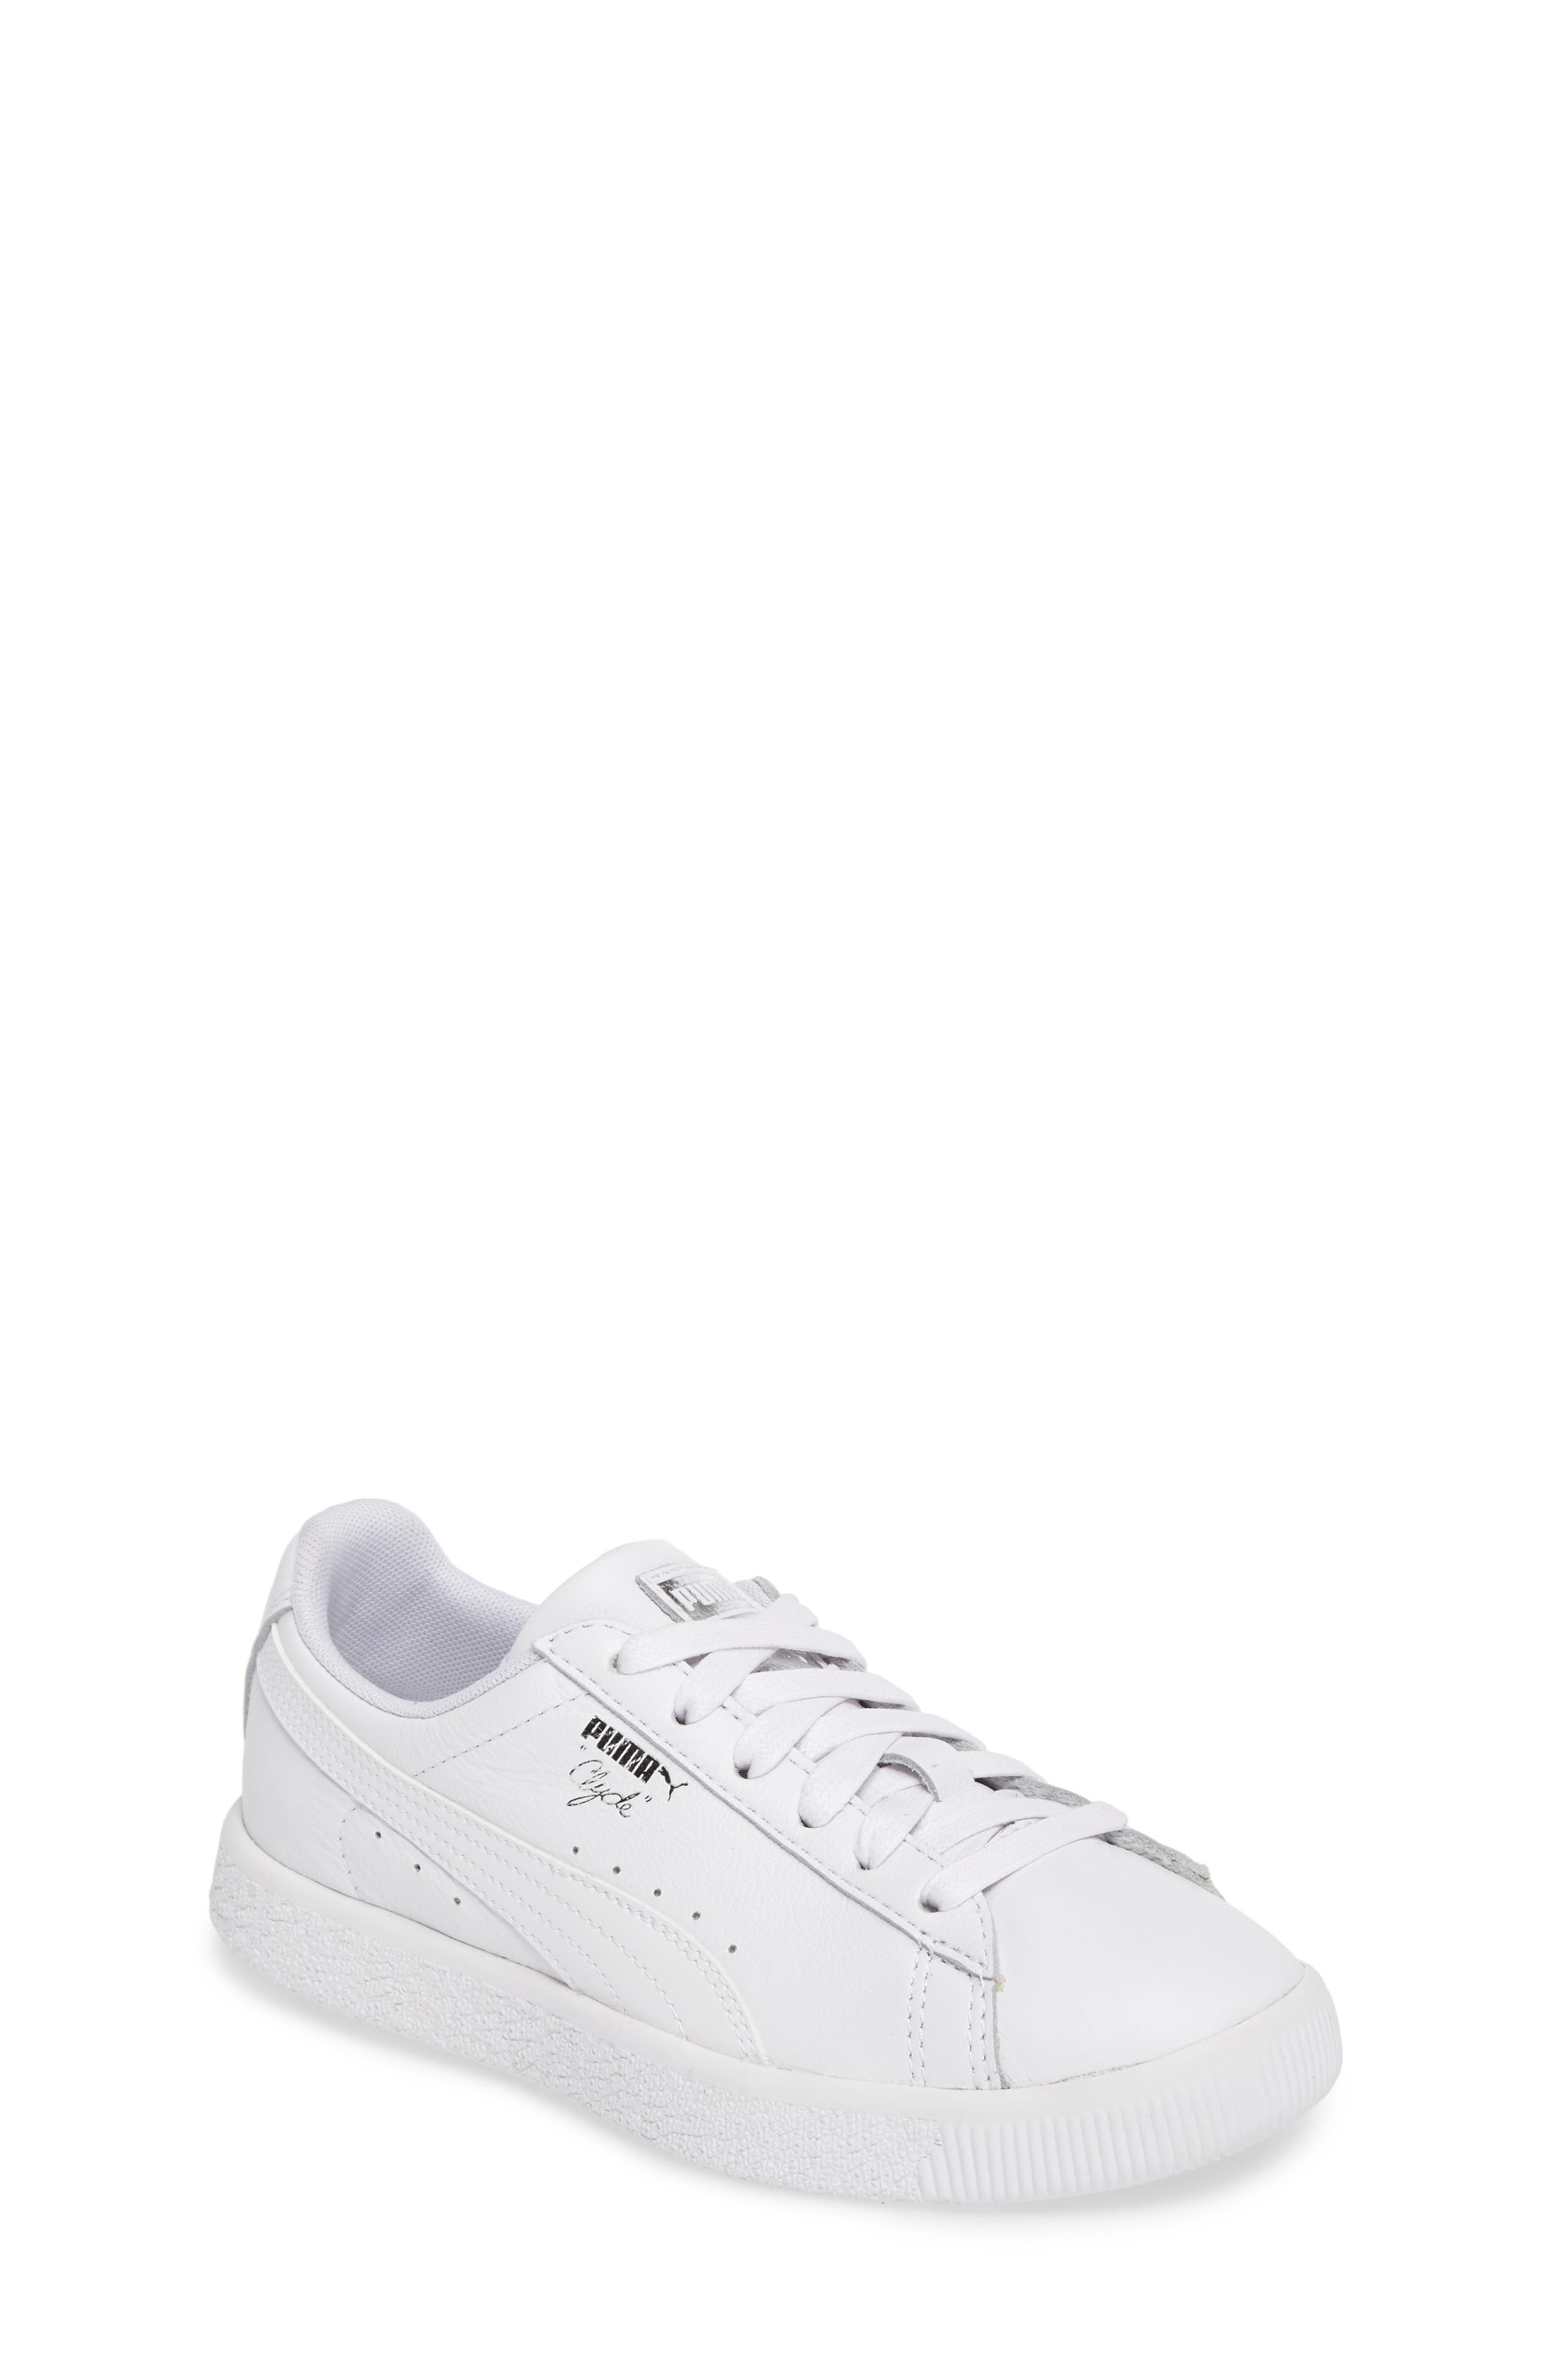 Clyde Core Foil Sneaker,                             Main thumbnail 1, color,                             White/ White